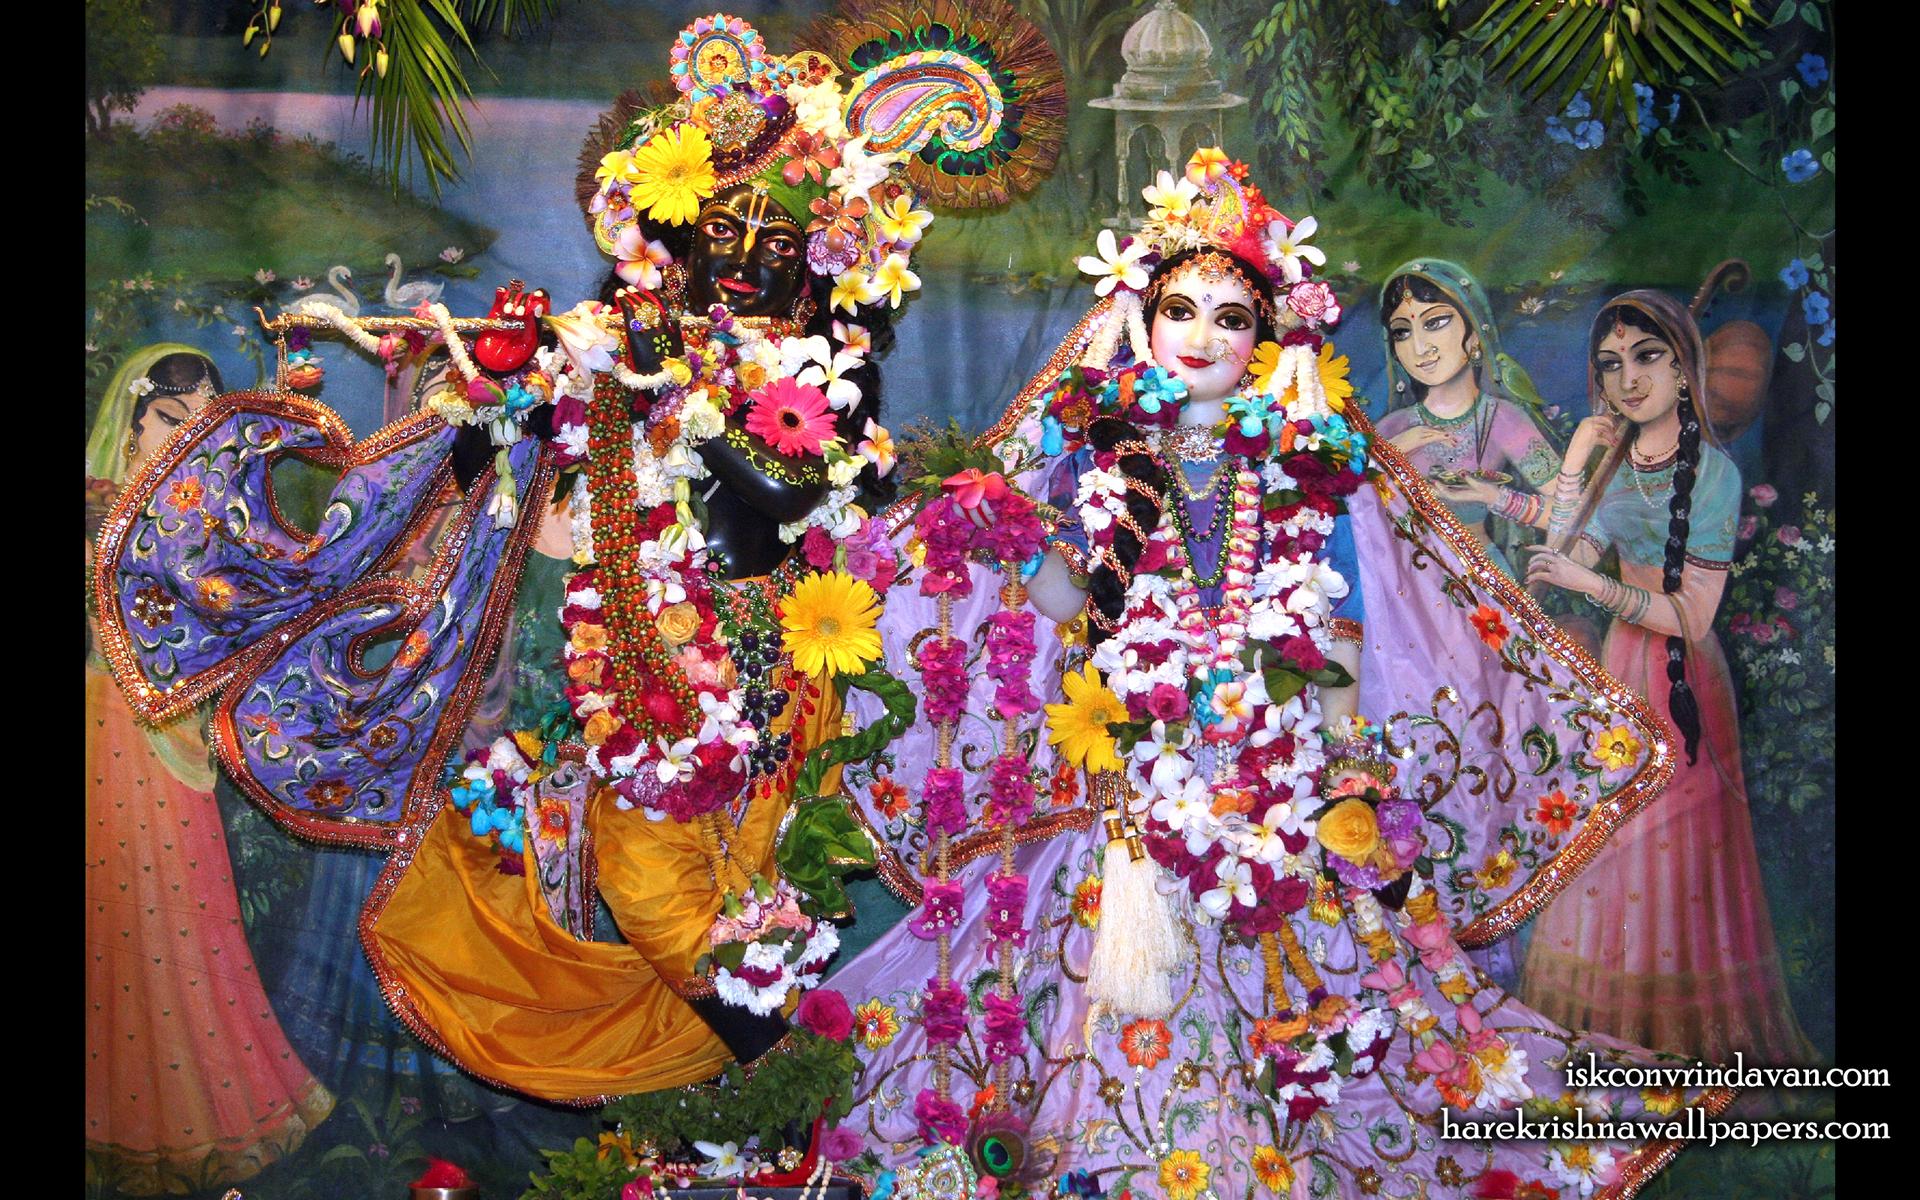 Sri Sri Radha Shyamsundar Wallpaper (014) Size 1920x1200 Download